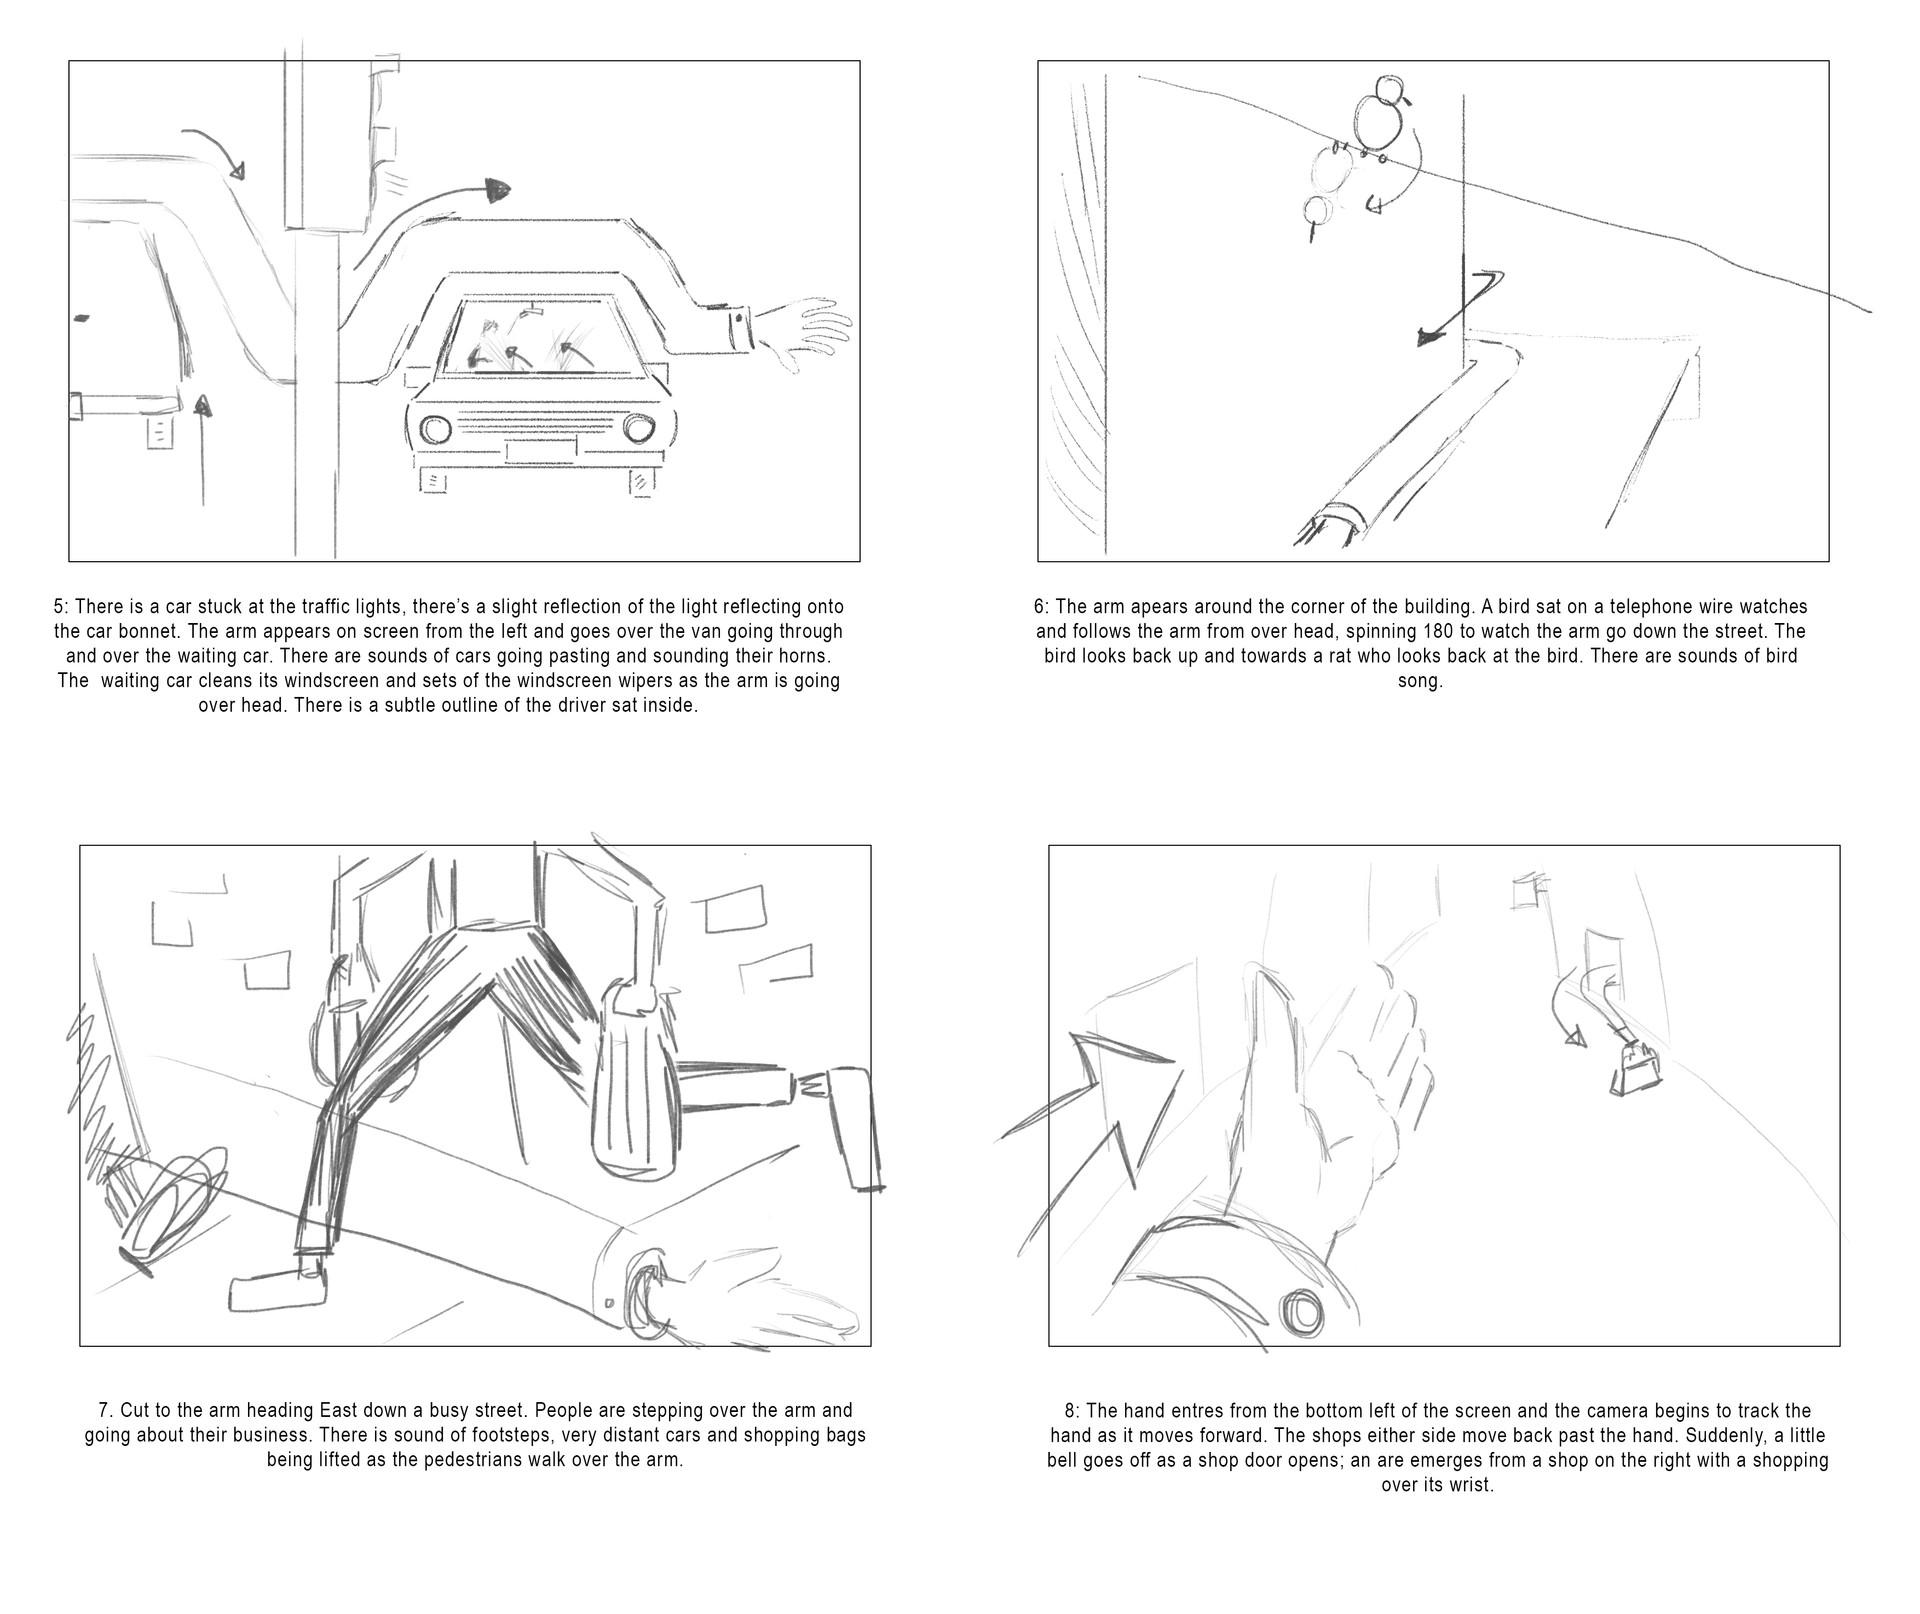 Storyboard 5-8